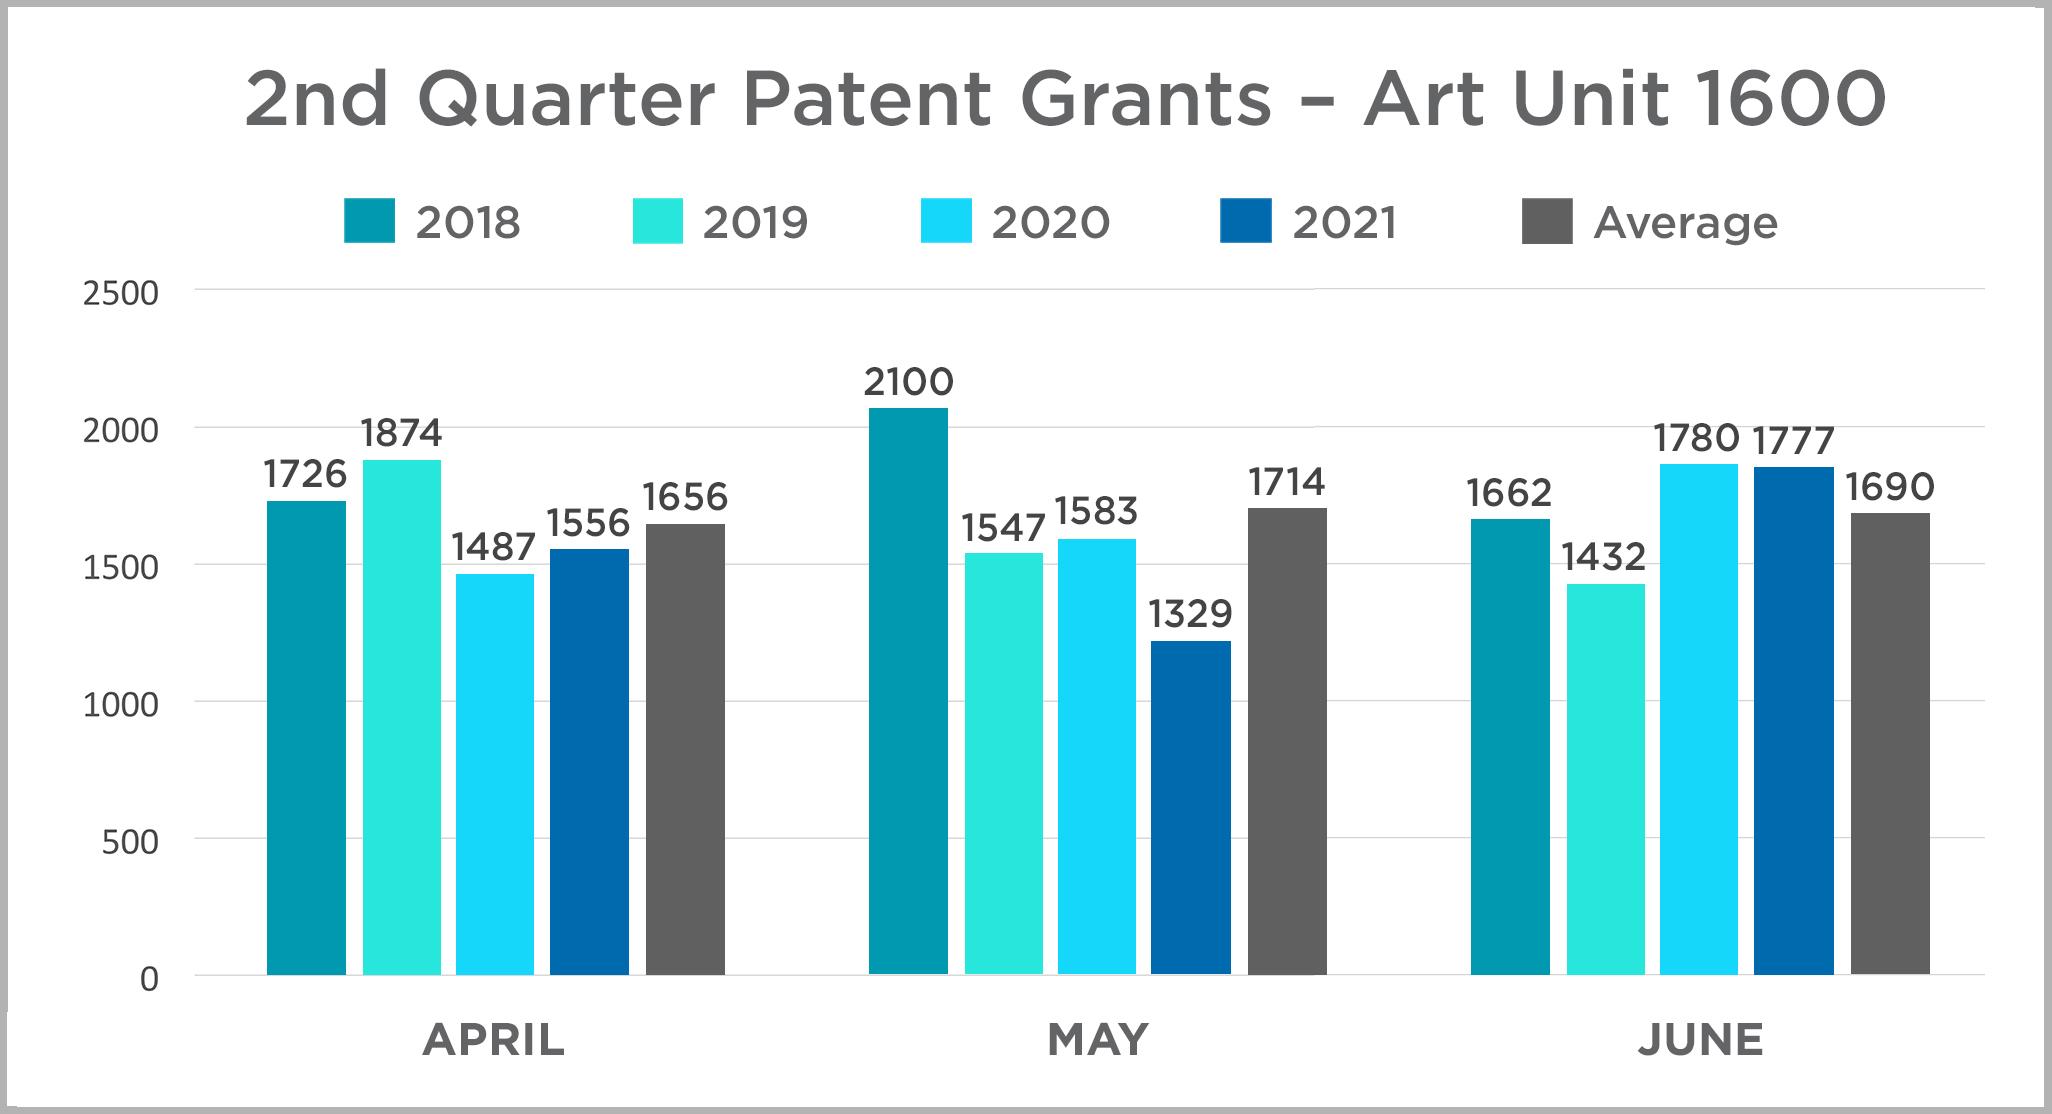 2nd quarter 2021 patent grants - Art Unit 1600